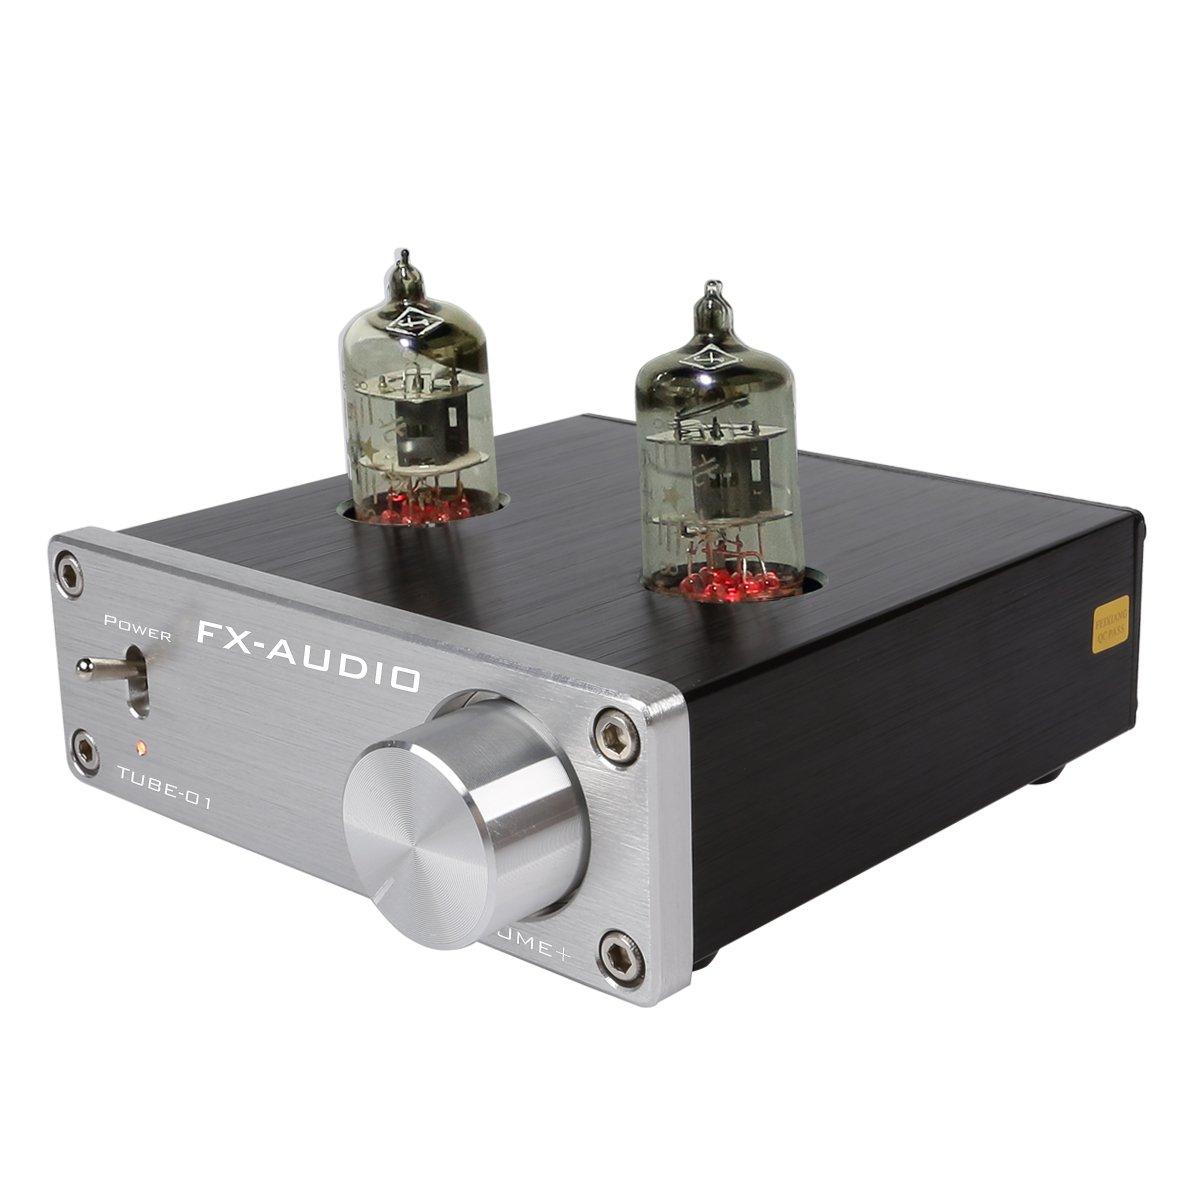 JouerNow FX Tube-01 Pre-Amplifier HIFI Stereo Buffer Preamp, with Mini 6J1 Valve & Vacuum Tube, 12V (Silver)